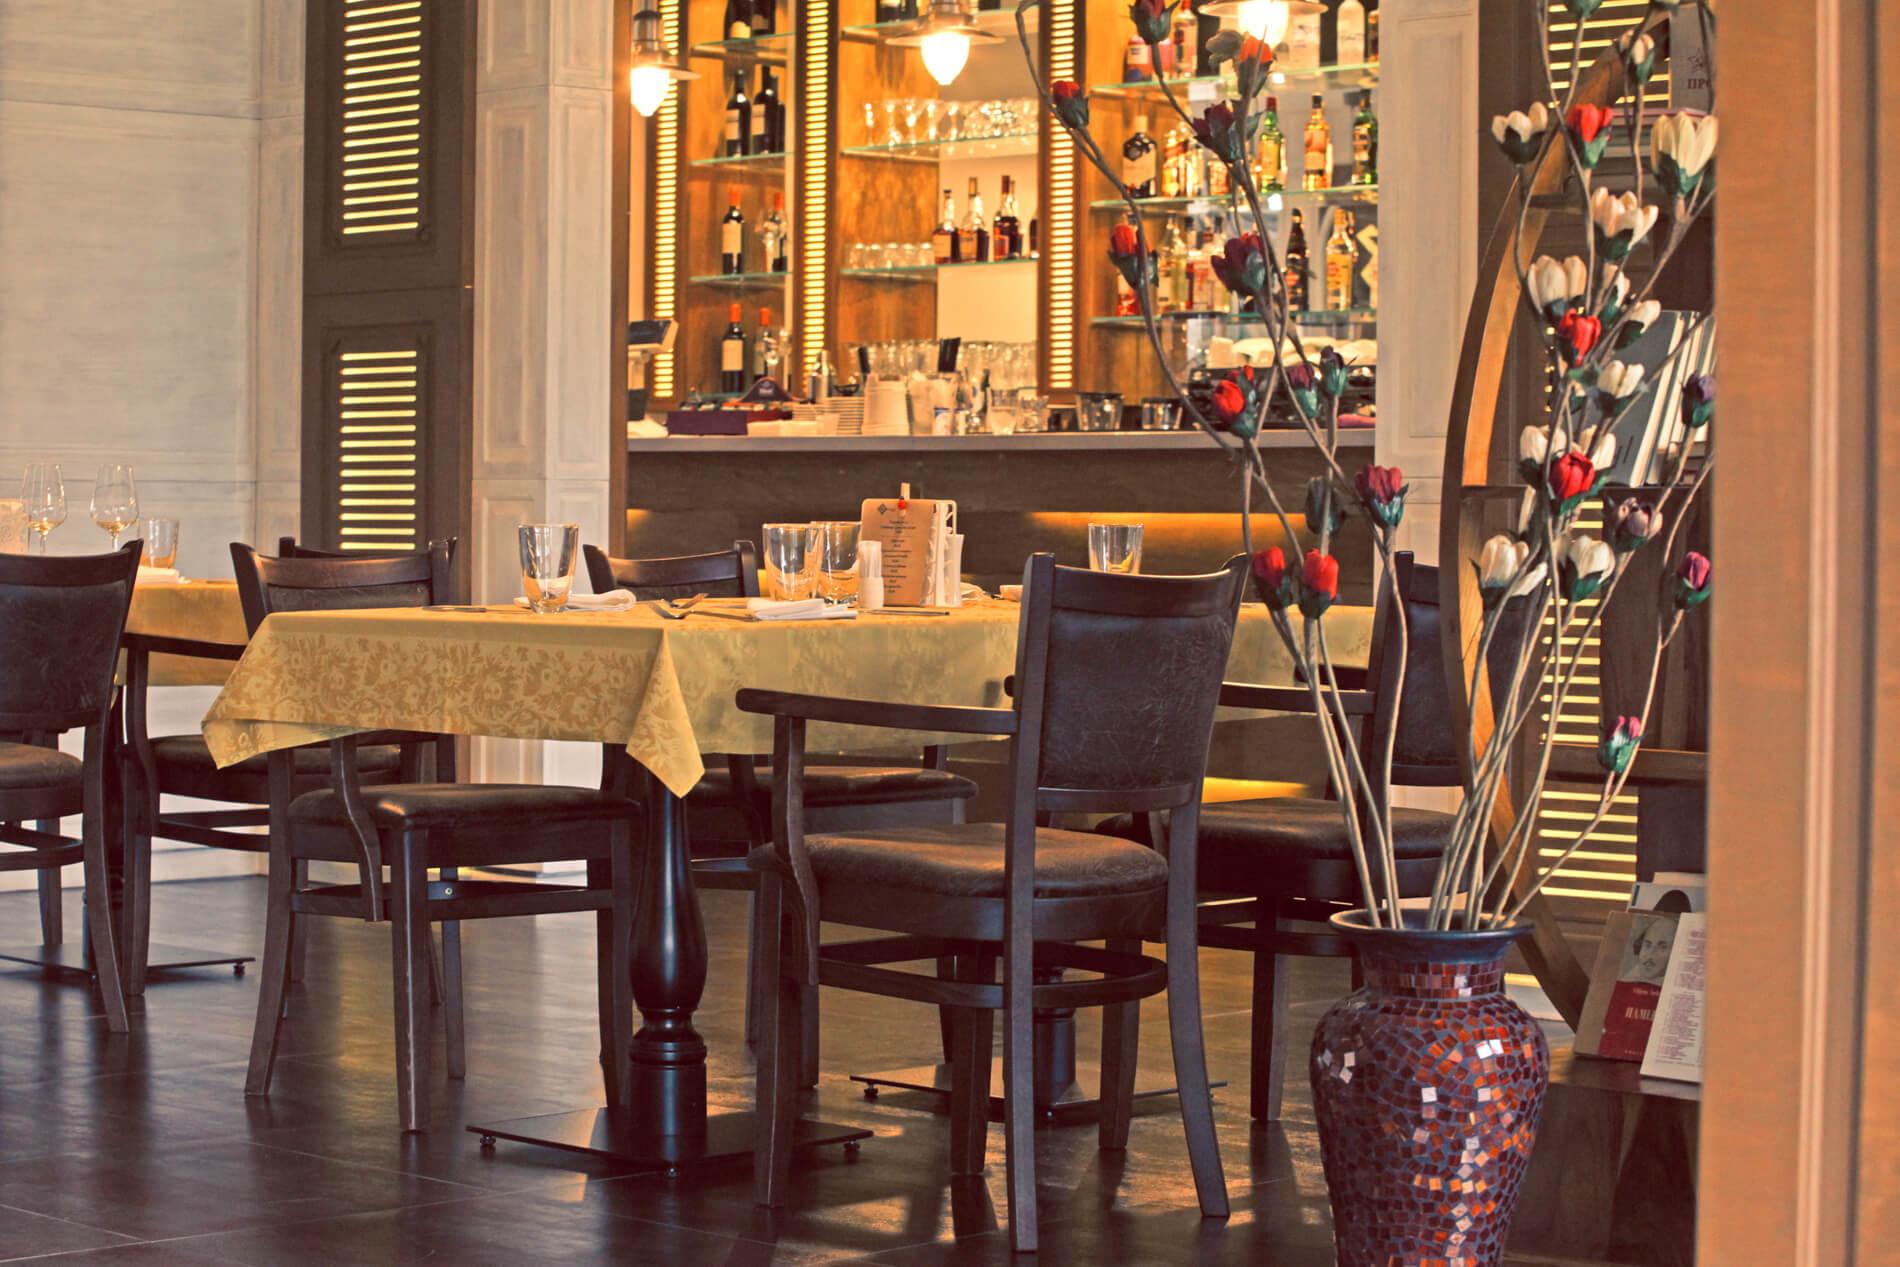 Upoznajte nas – Restoran Ćirilica